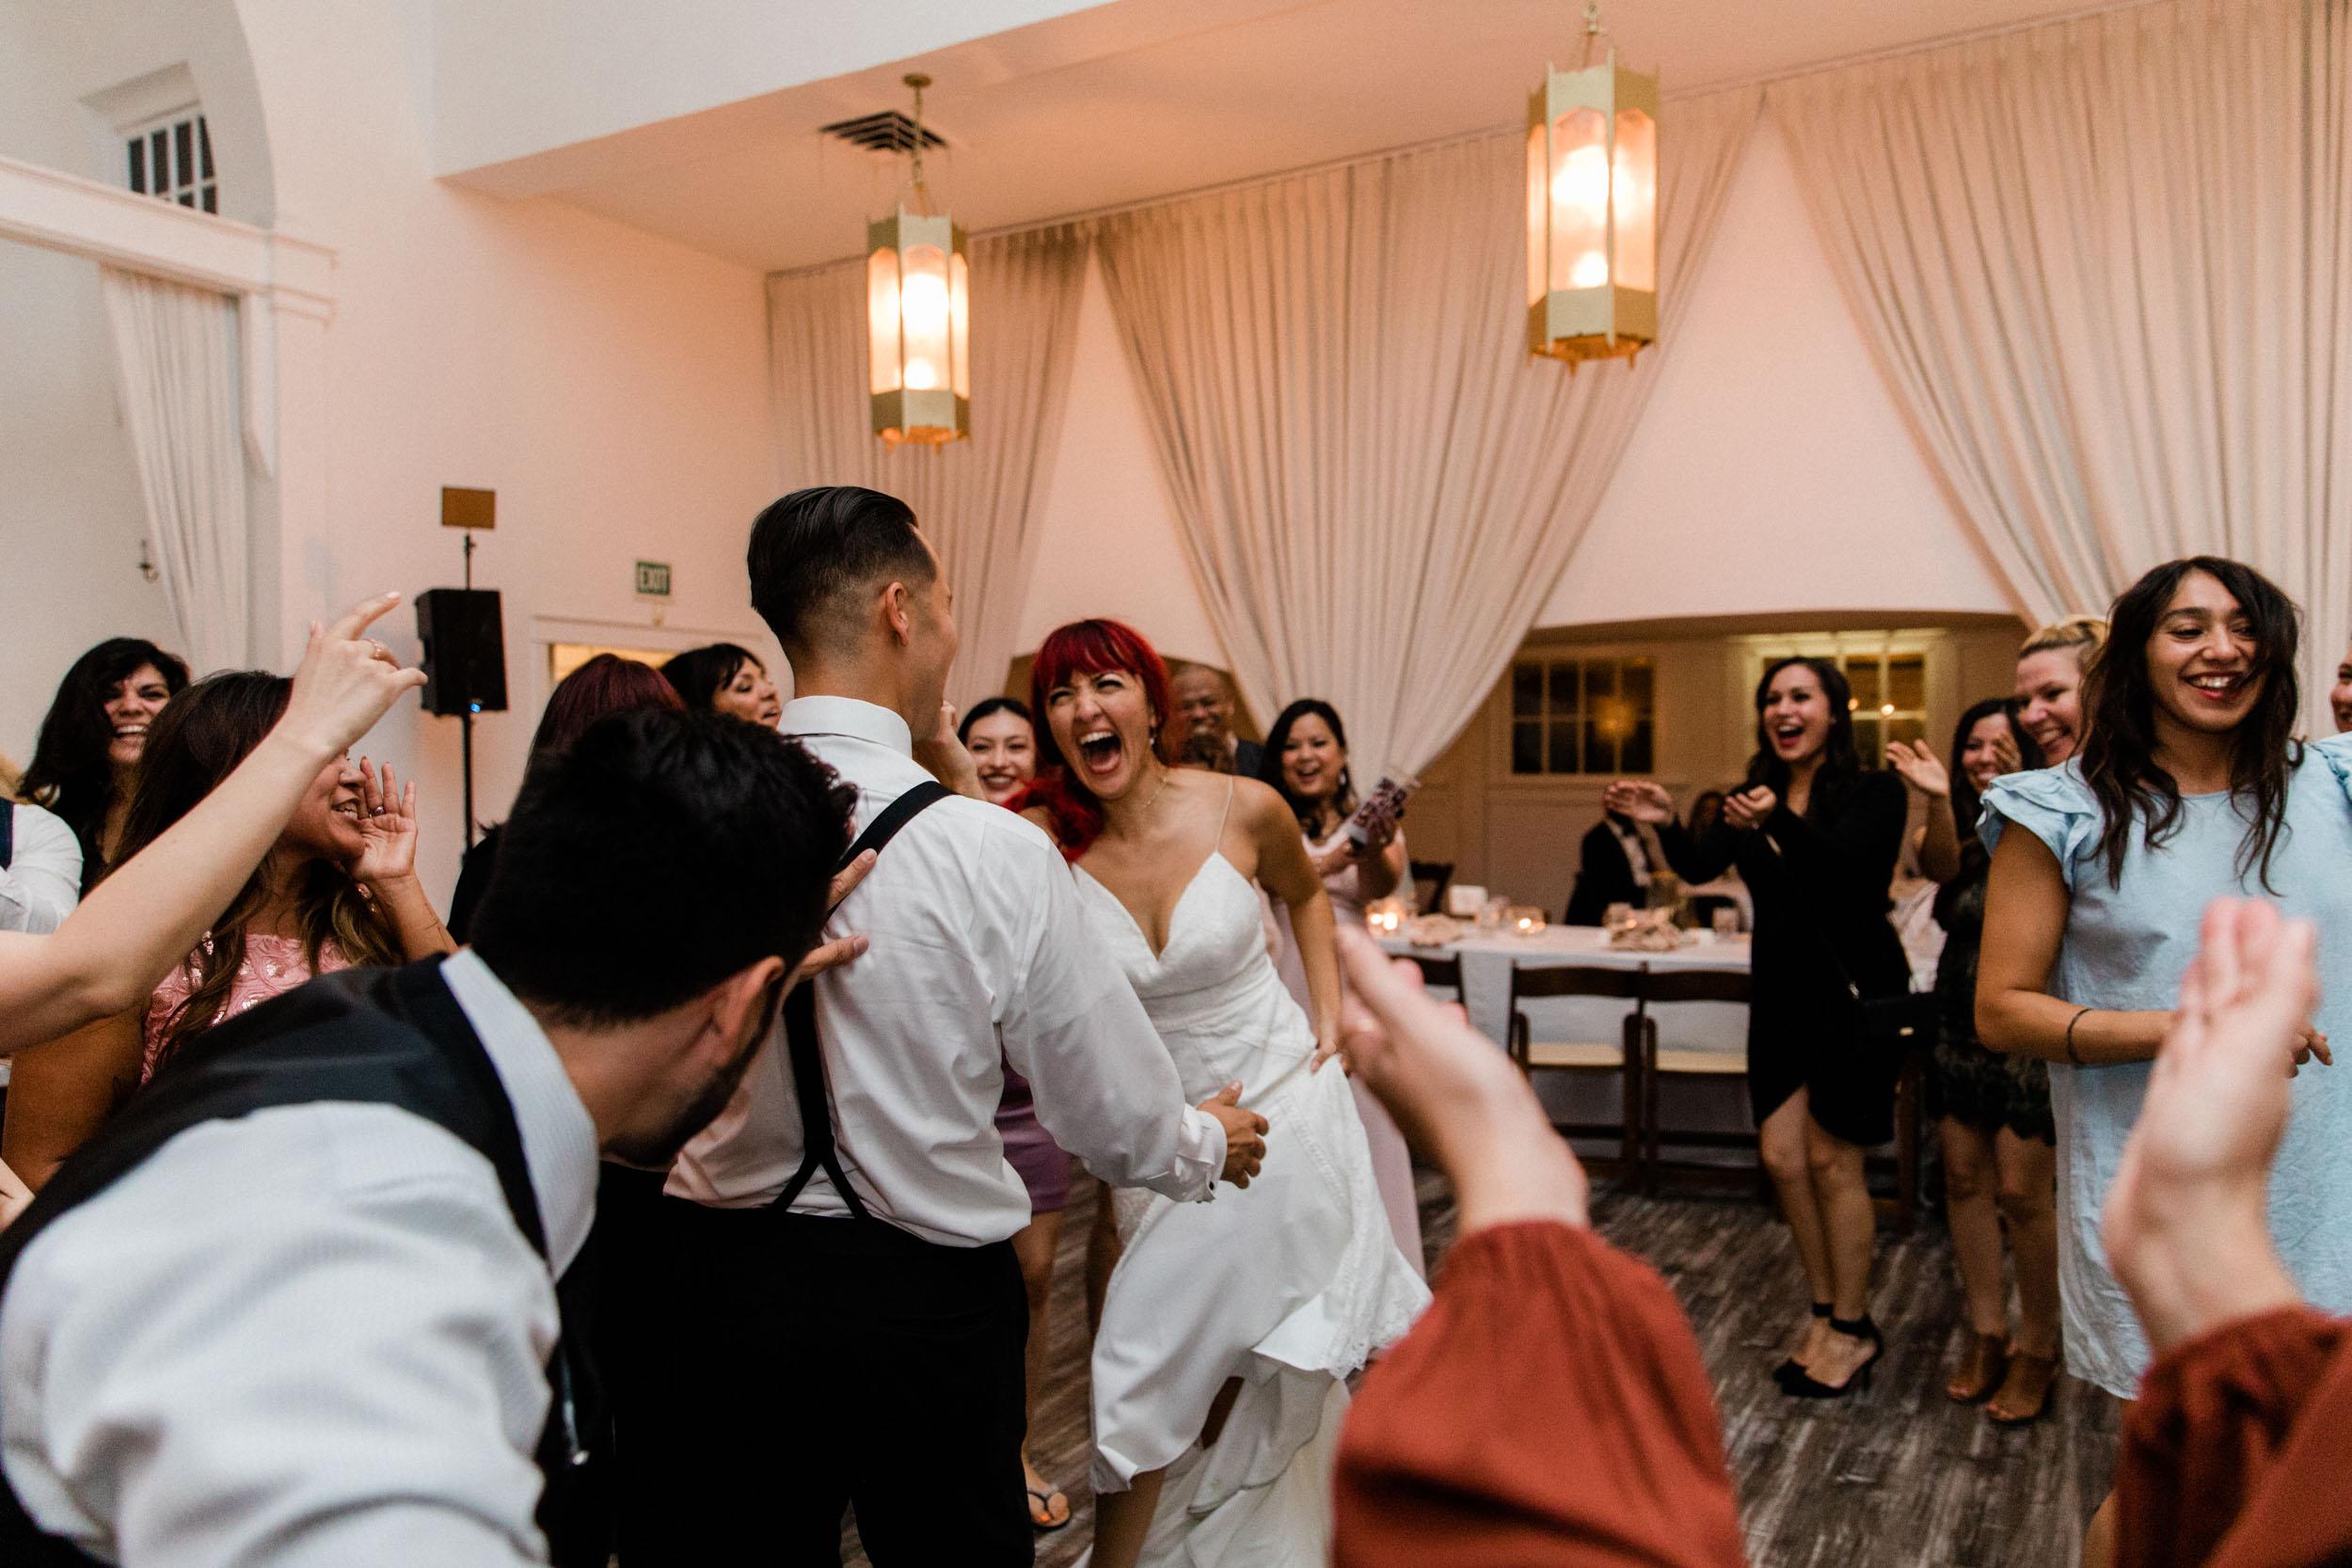 BKM-Photography-Los-Angeles-Highland-Park-York-Manor-Wedding-Photography-1298.jpg